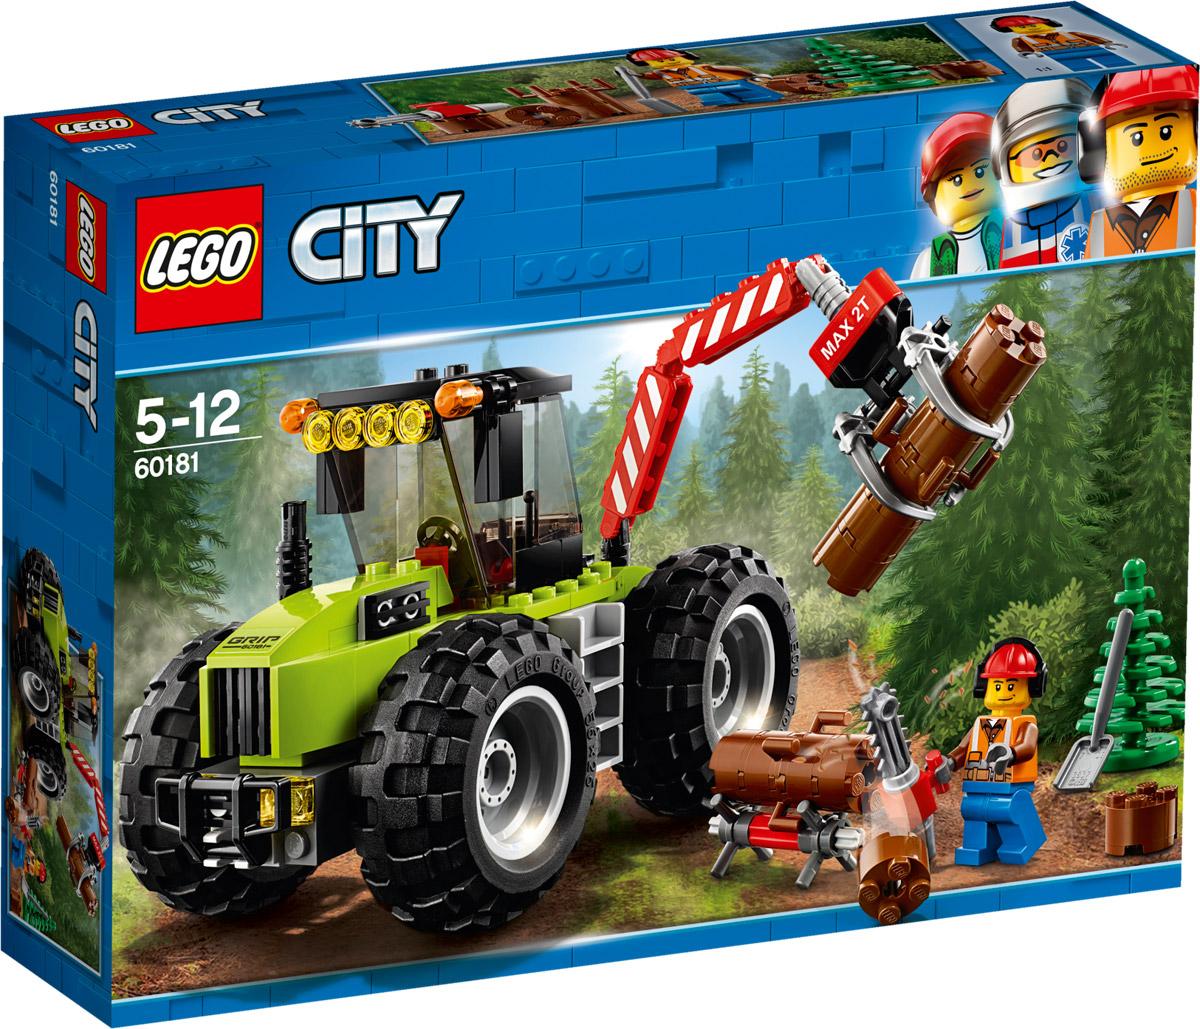 LEGO City Great Vehicles Конструктор Лесной трактор 60181 футболка женская baon цвет белый b237081 white размер xl 50